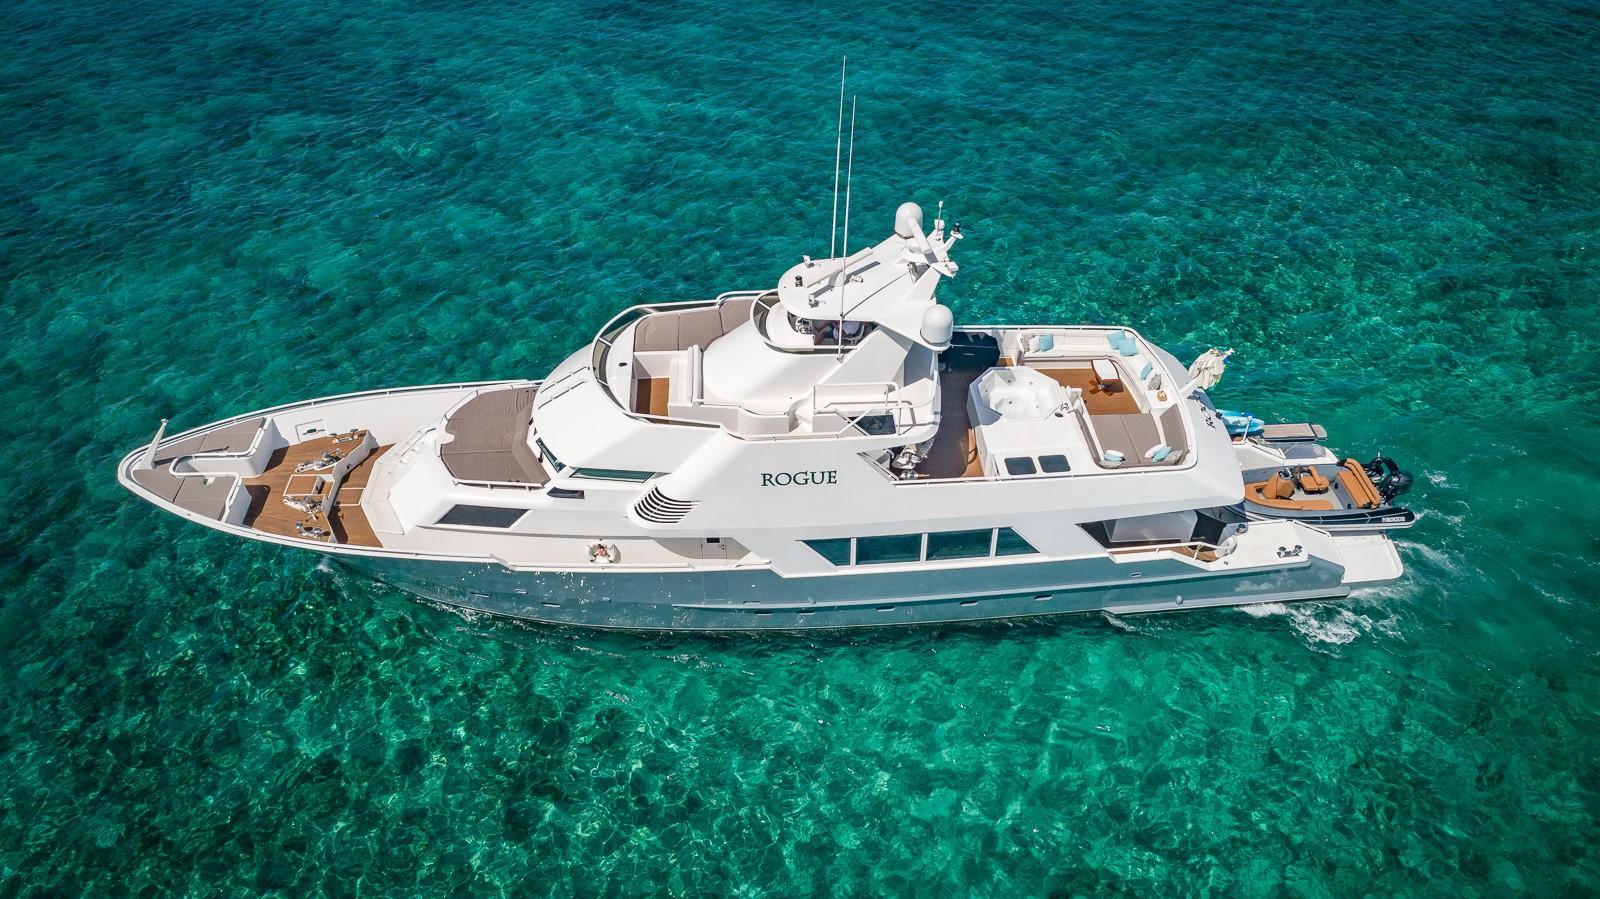 1984 Poole Chaffee 105 Motor Yacht Hmy Yacht Sales